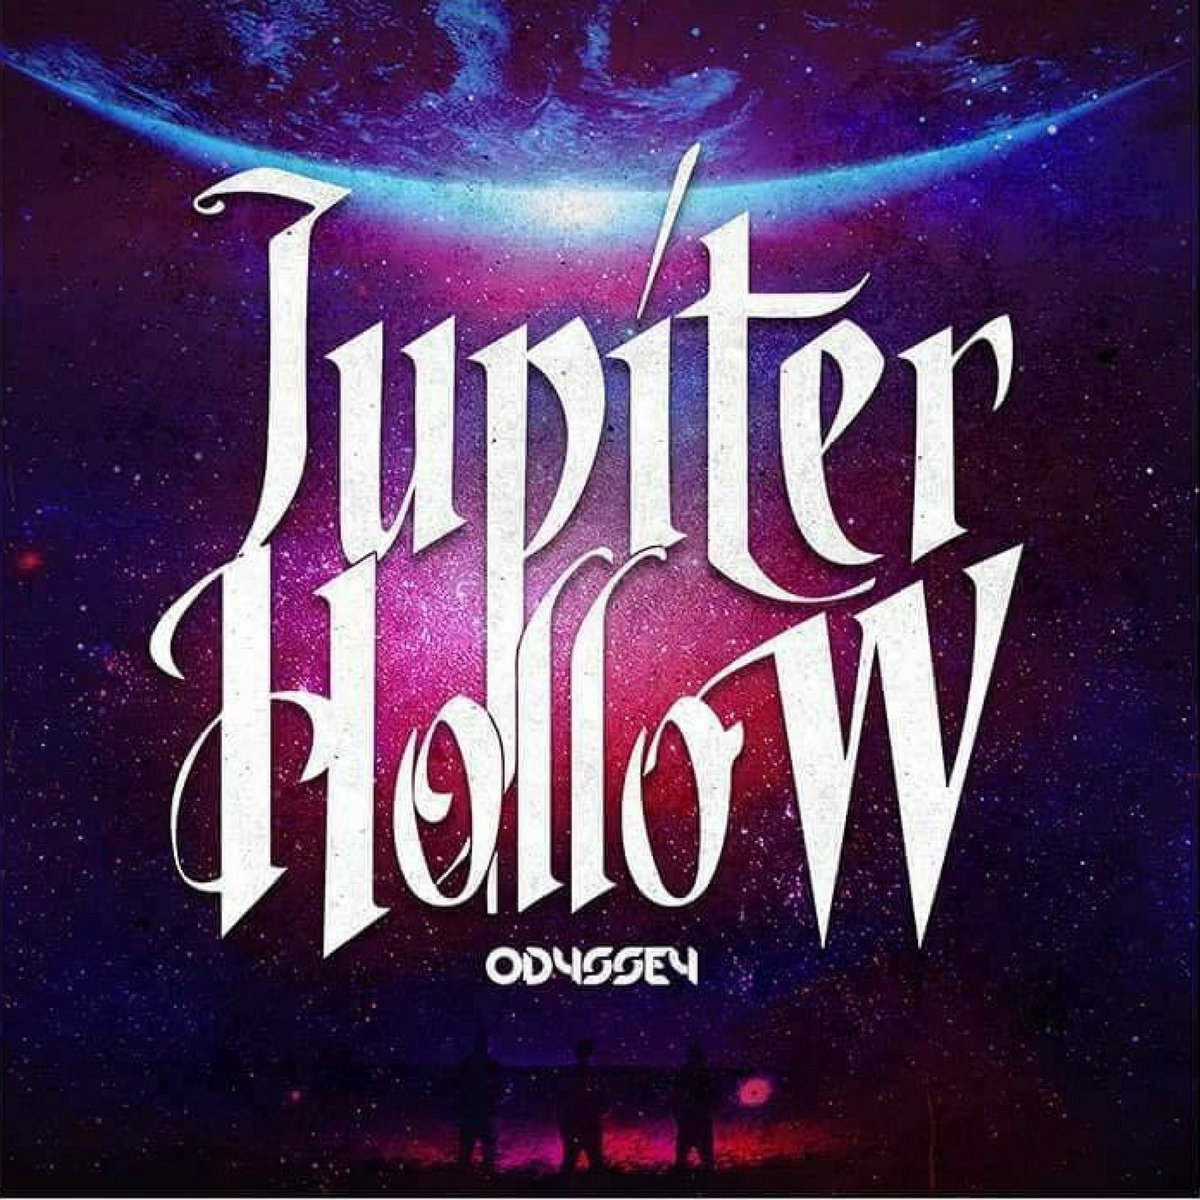 Jupiter Hollow: Odyssey